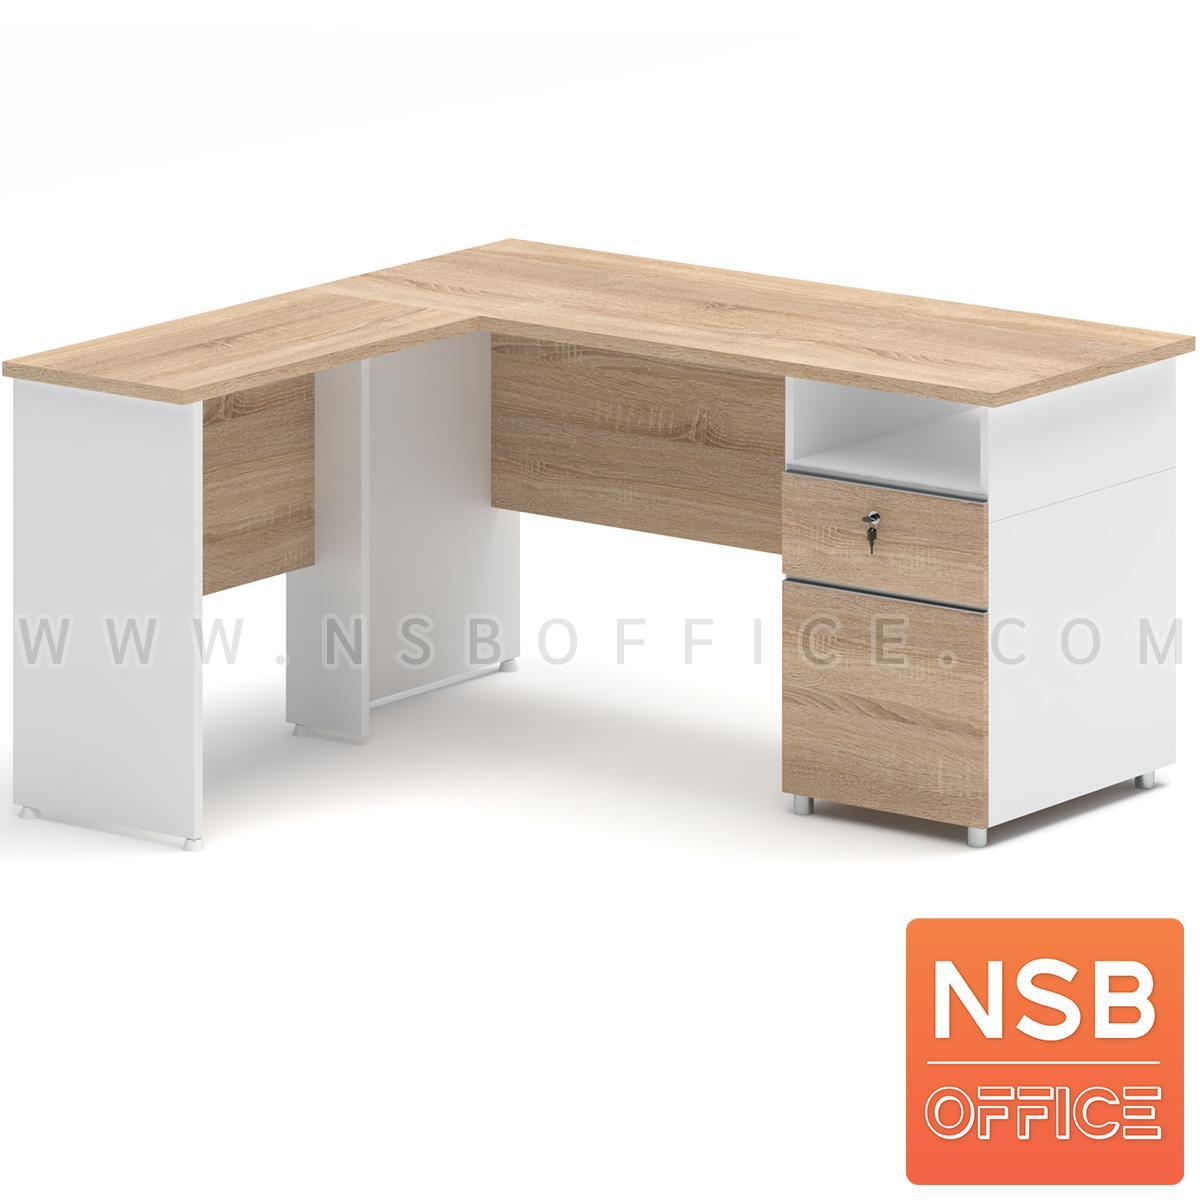 A21A016:โต๊ะทำงานตัวแอล 2 ลิ้นชัก รุ่น Milbert (มิลเบิร์ต) ขนาด 150W cm. เมลามีน สีเนเจอร์ทีค-ขาว